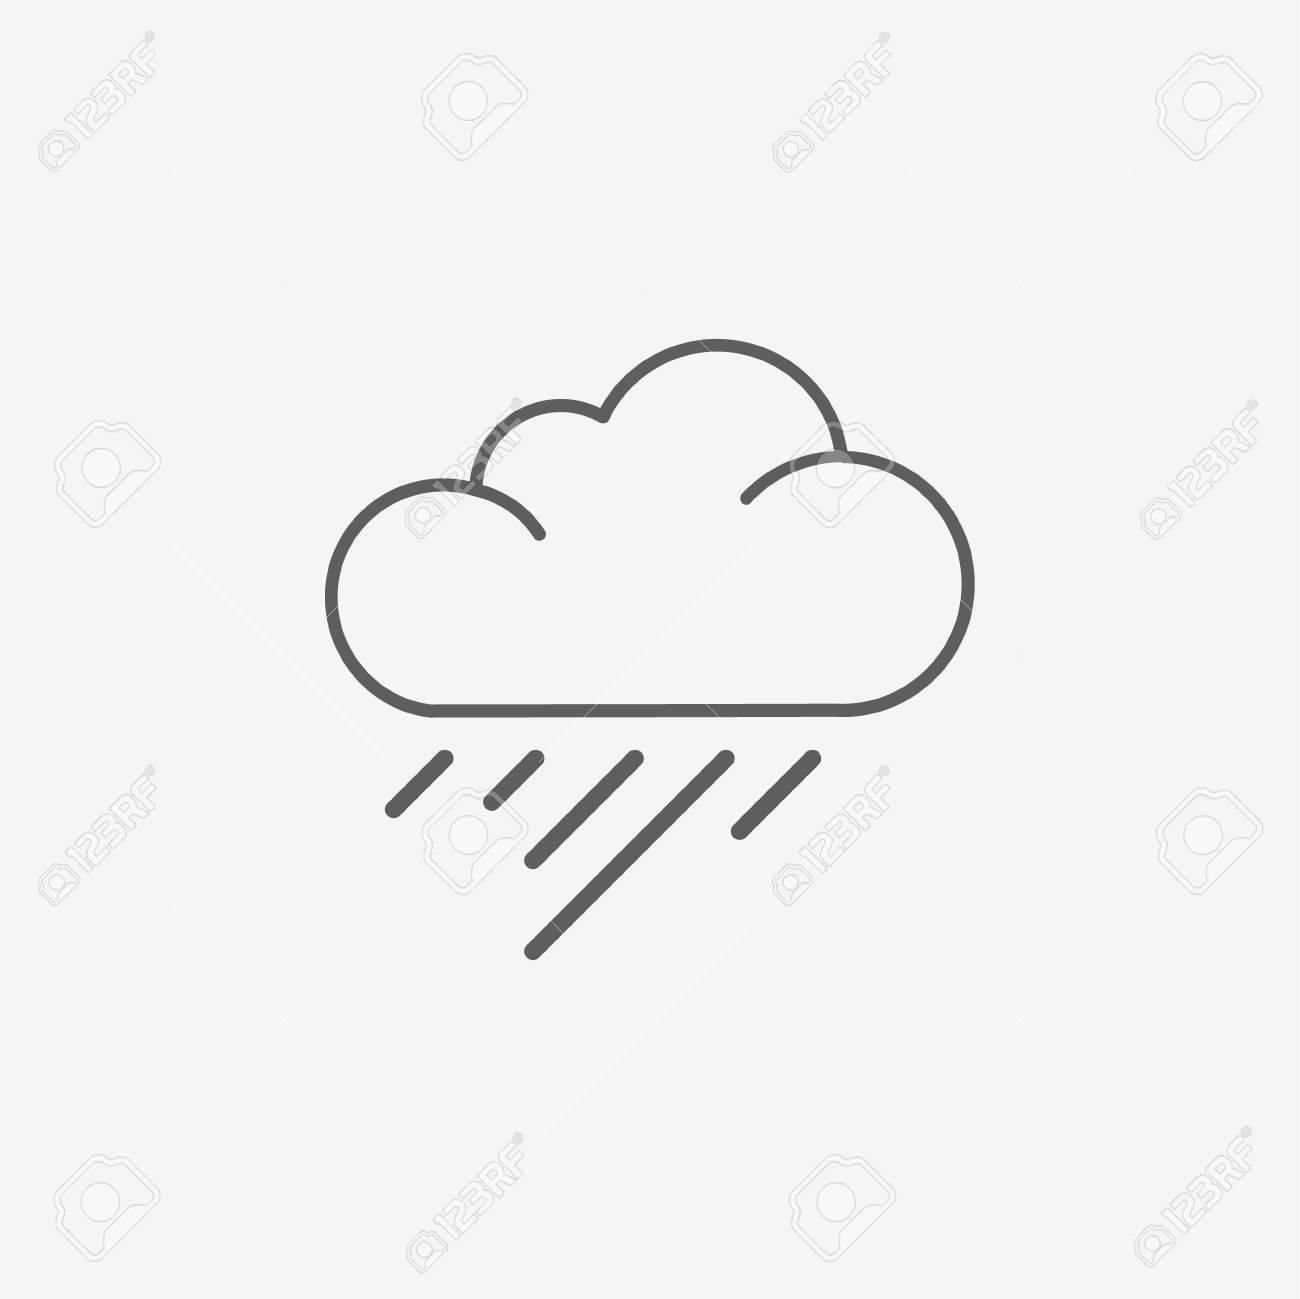 rain cloud cartoon illustration vector royalty free cliparts rh 123rf com cartoon rain cloud and sun cartoon rain cloud with lightning